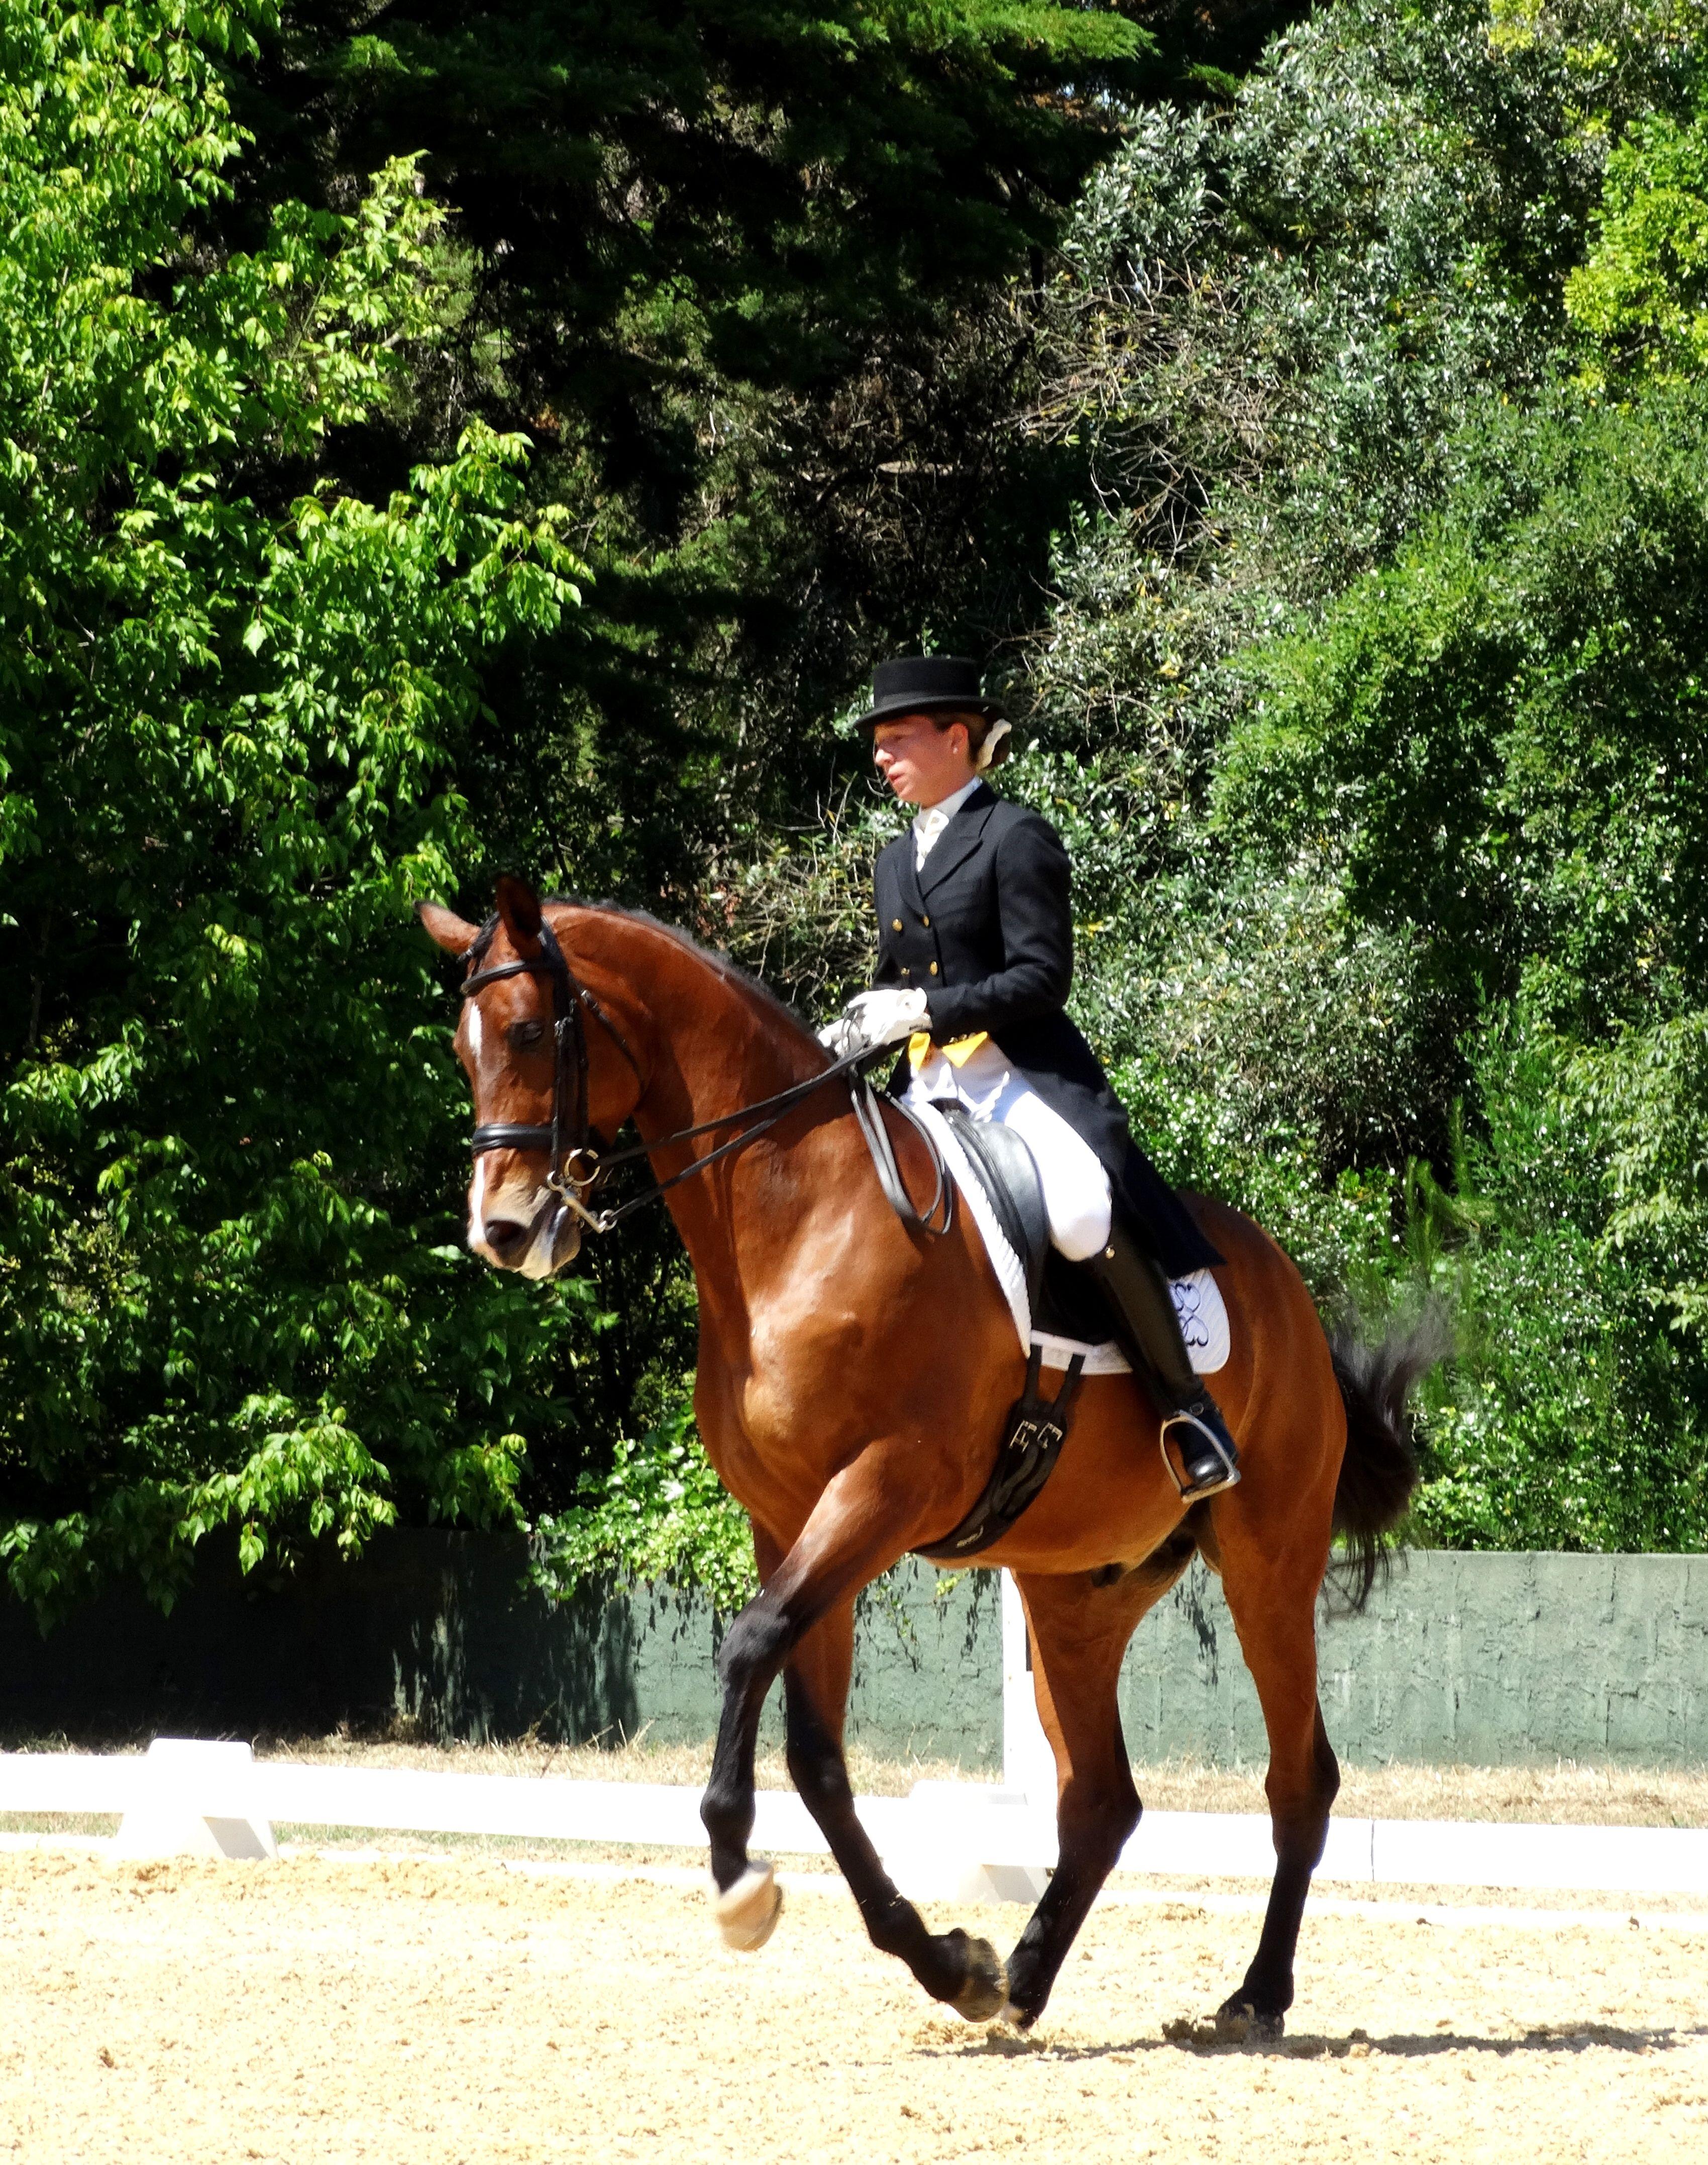 This week-end, our rider Morgane and her horse Basco du Feuillard participated to II Jornada da Taça de Portugal de Dressage ! #competition #horse #dressage #quintam